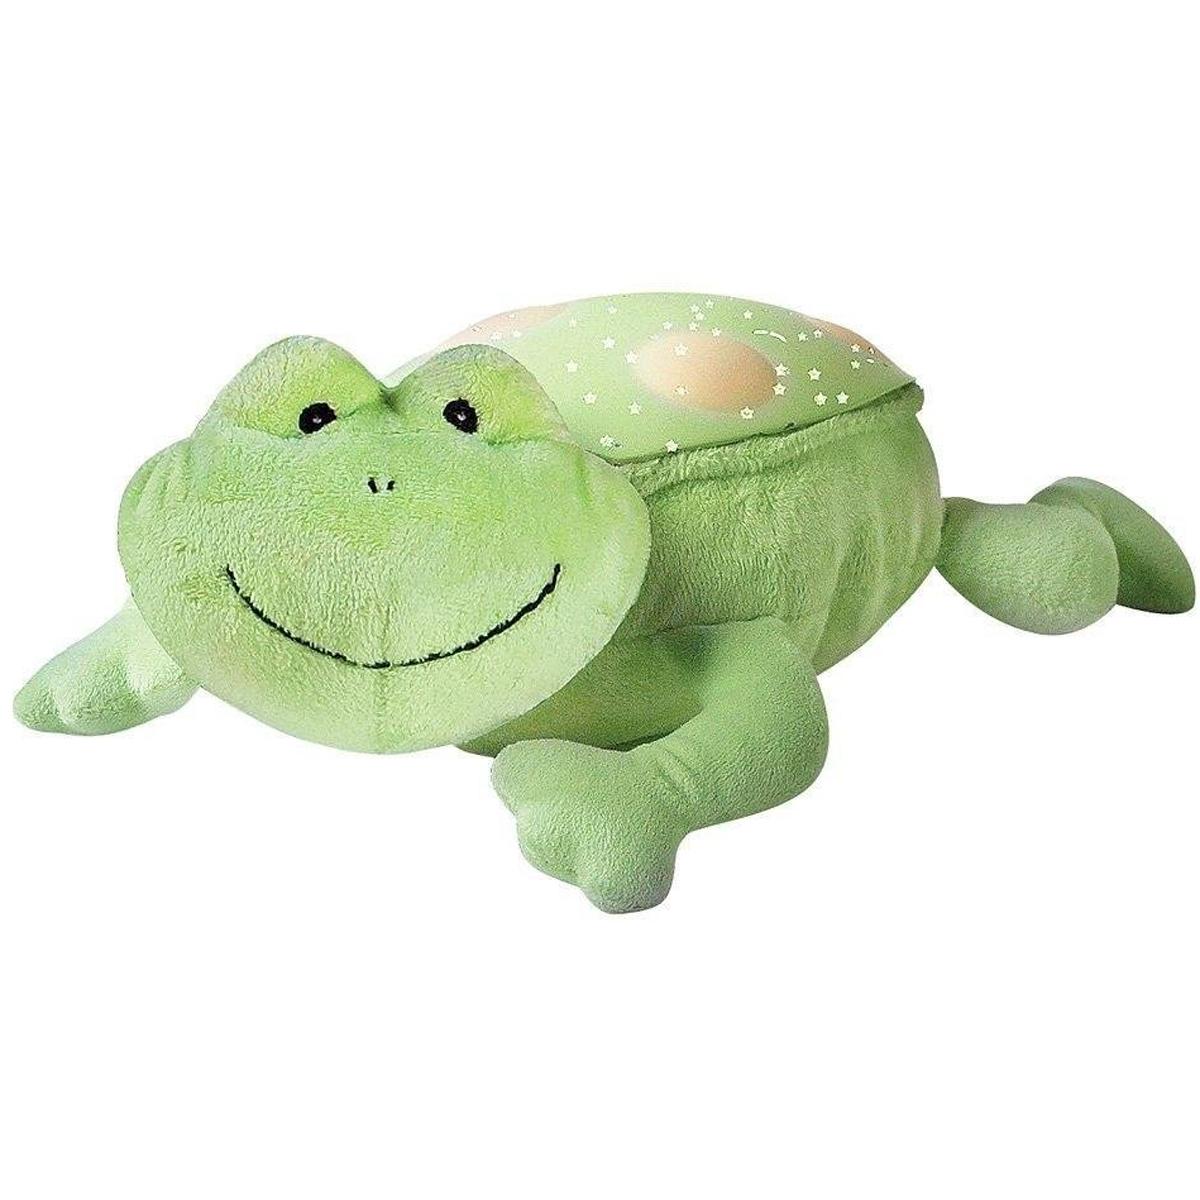 Den chieu sao ru ngu hinh chu ech Summer Slumber buddies Frog